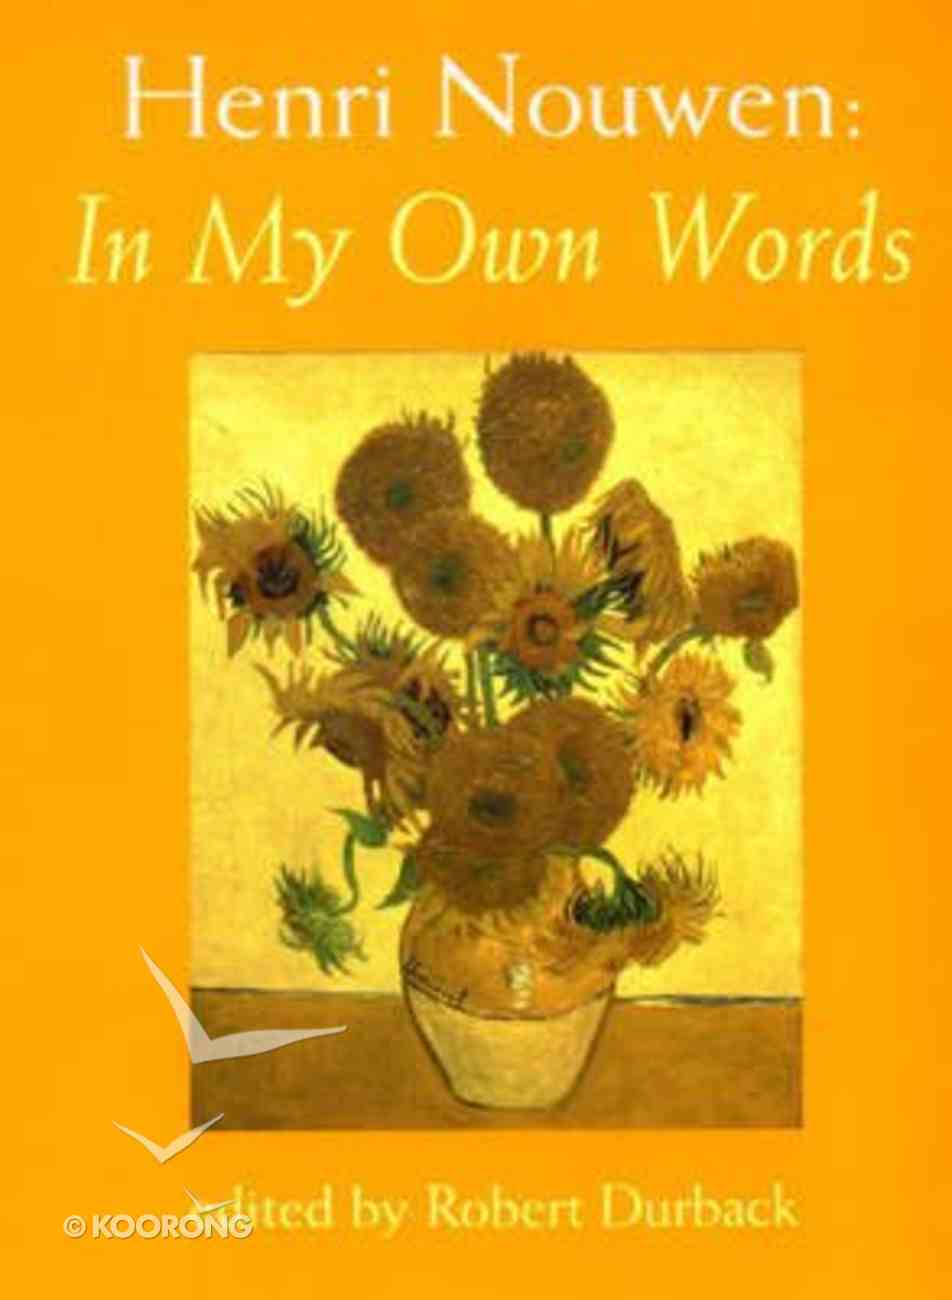 Henri Nouwen in My Own Words Paperback